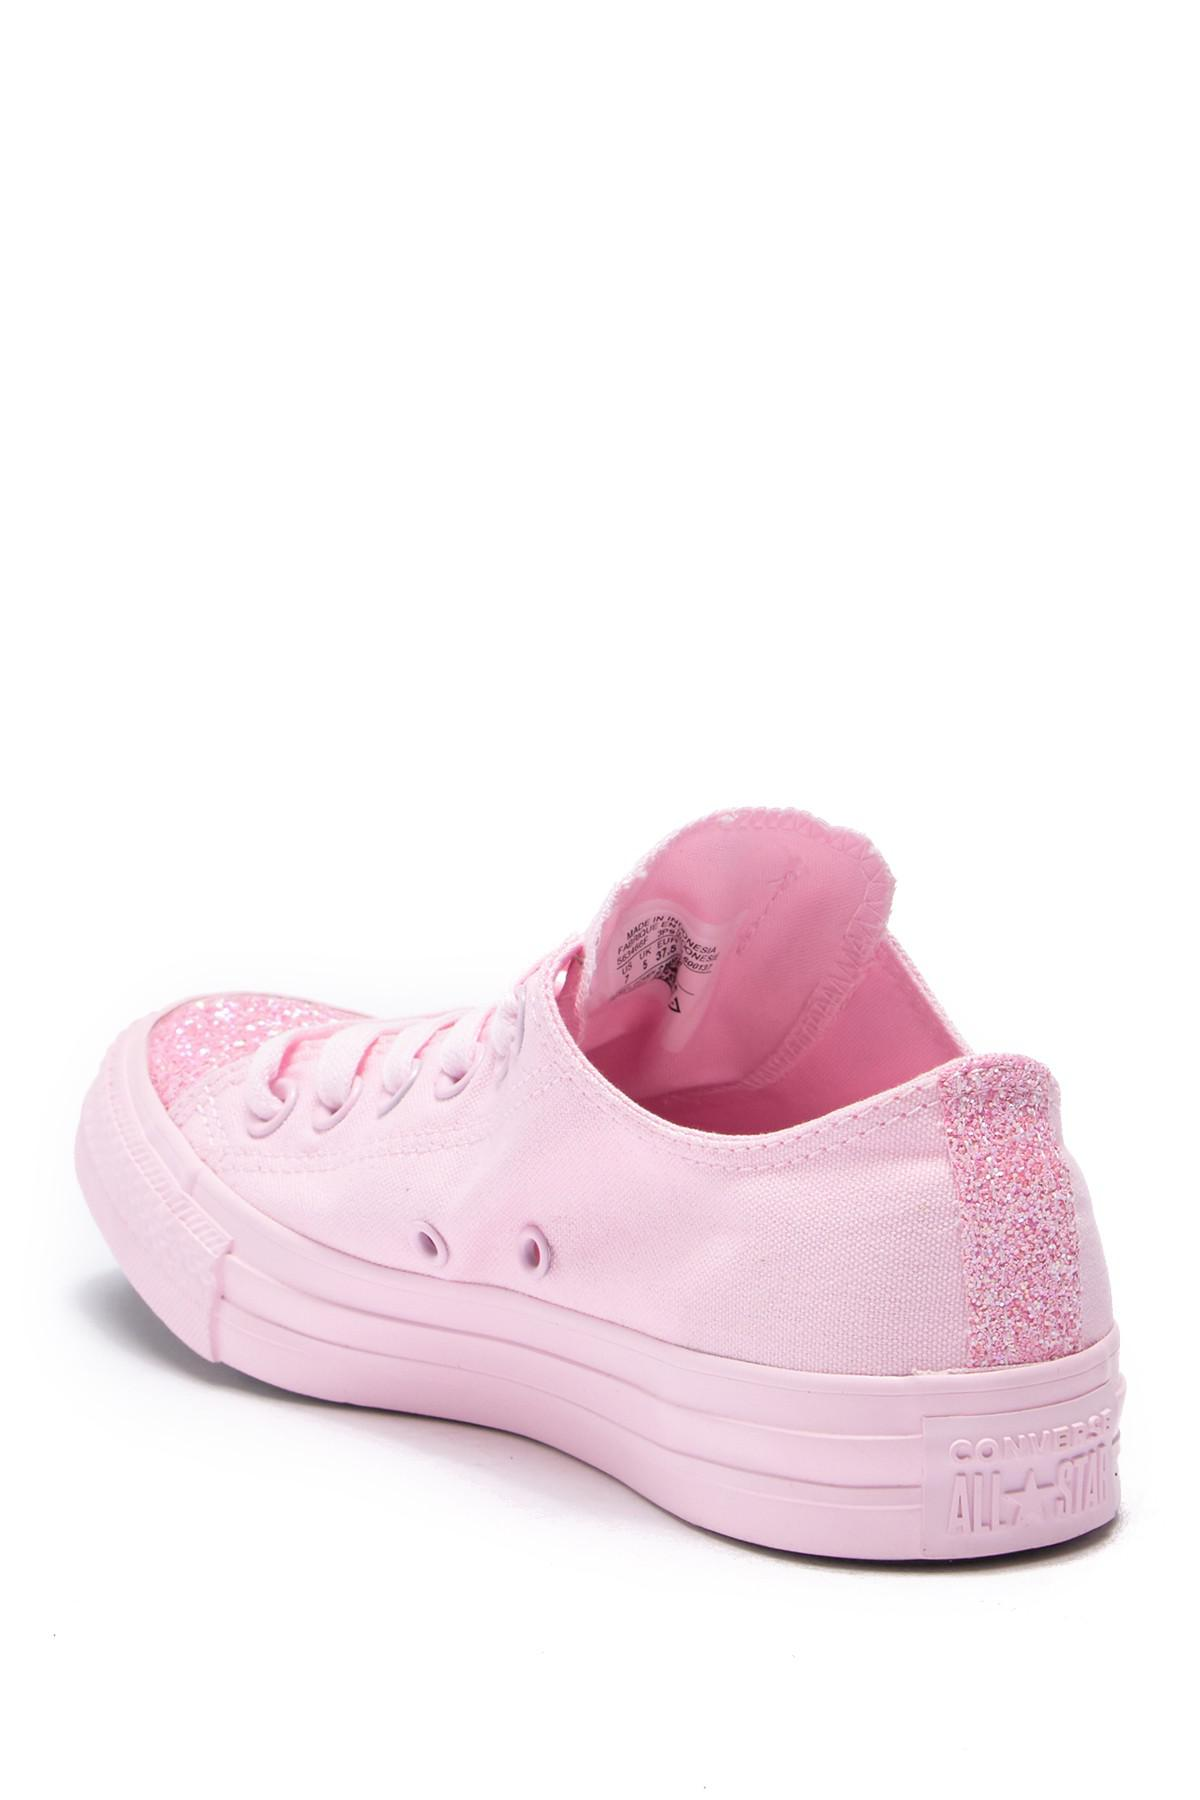 8e360eed8339 Converse - Pink Chuck Taylor All Star Ox Glitter Toe Sneaker (women) -  Lyst. View fullscreen